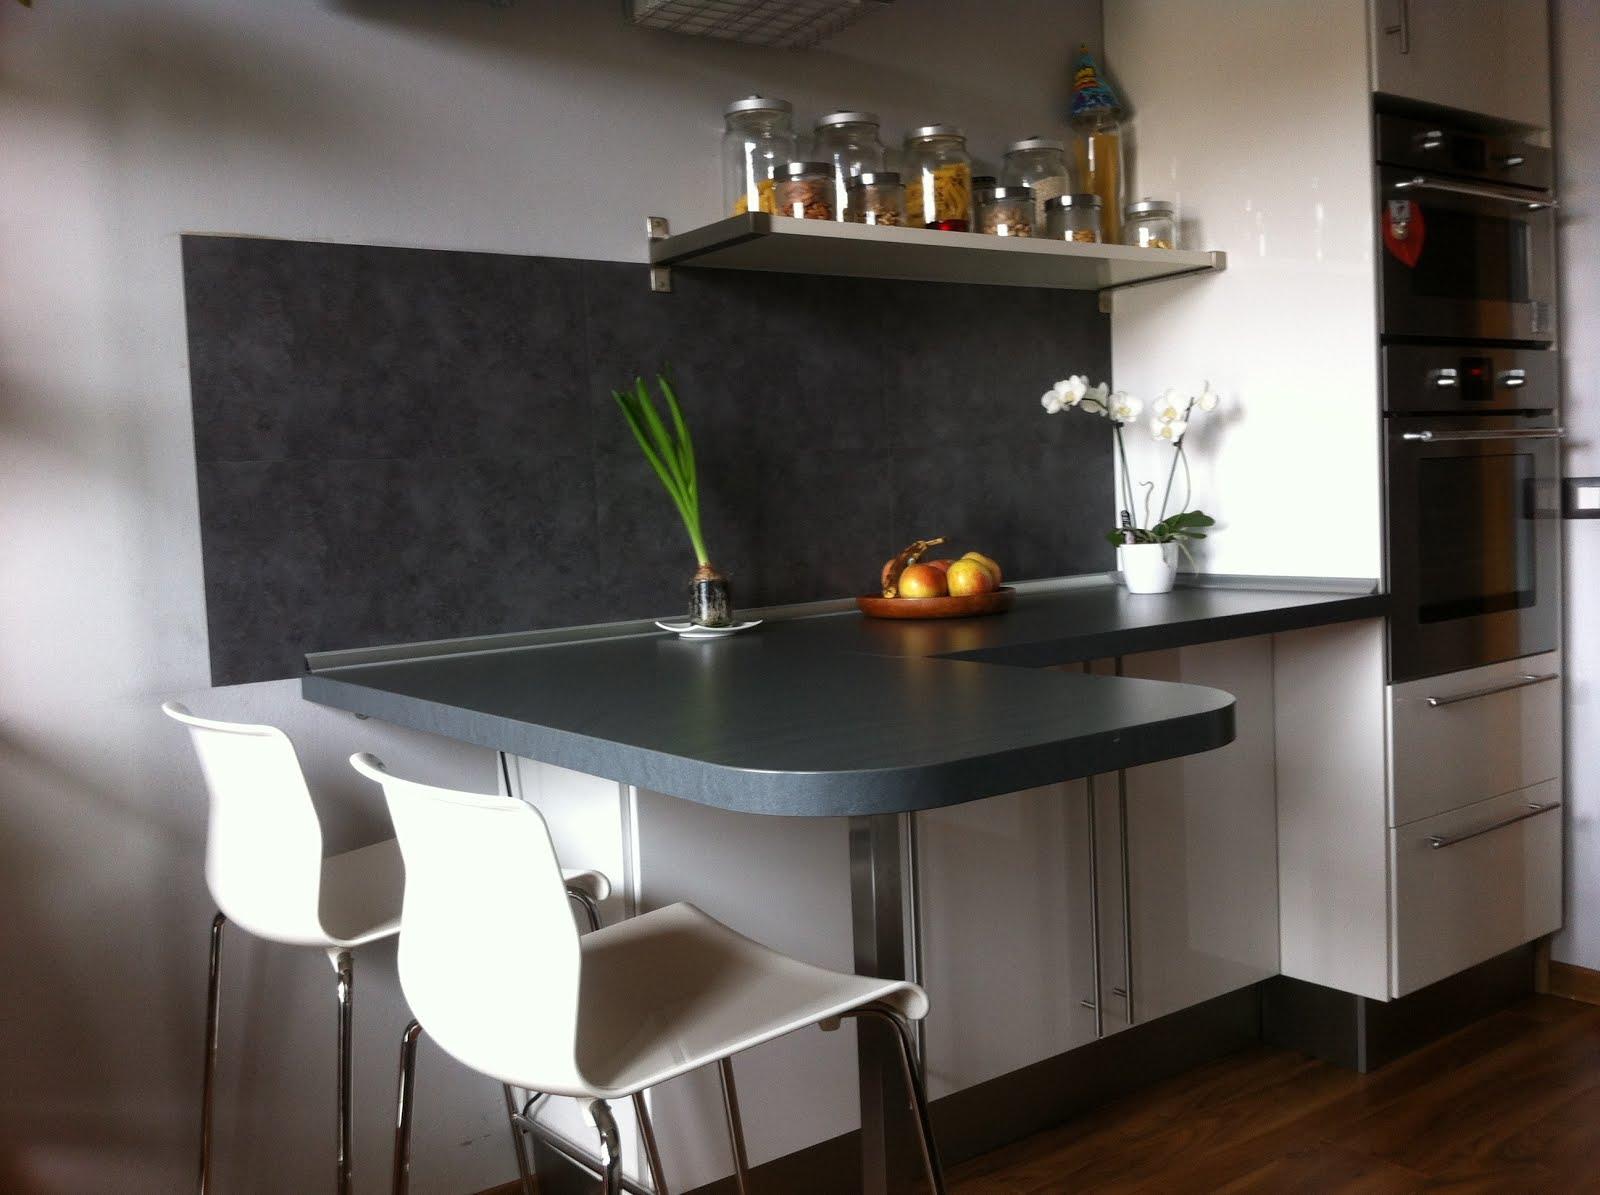 Piastrelle in pvc in cucina for Adesivi mattonelle cucina